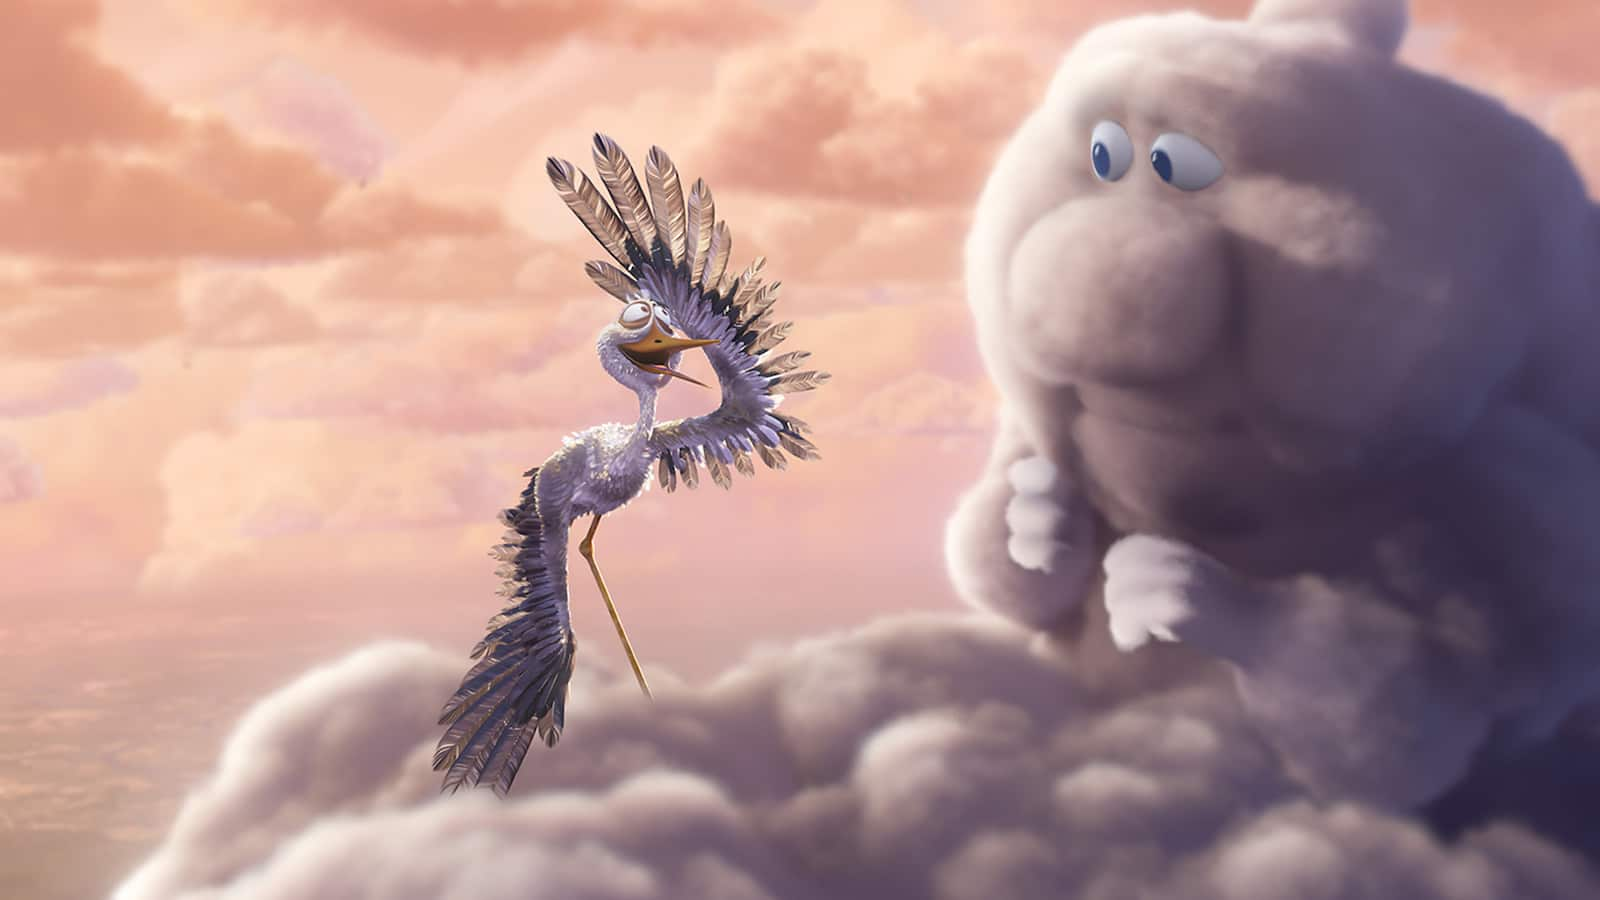 pixar-short-films-collection-volume-2-2012